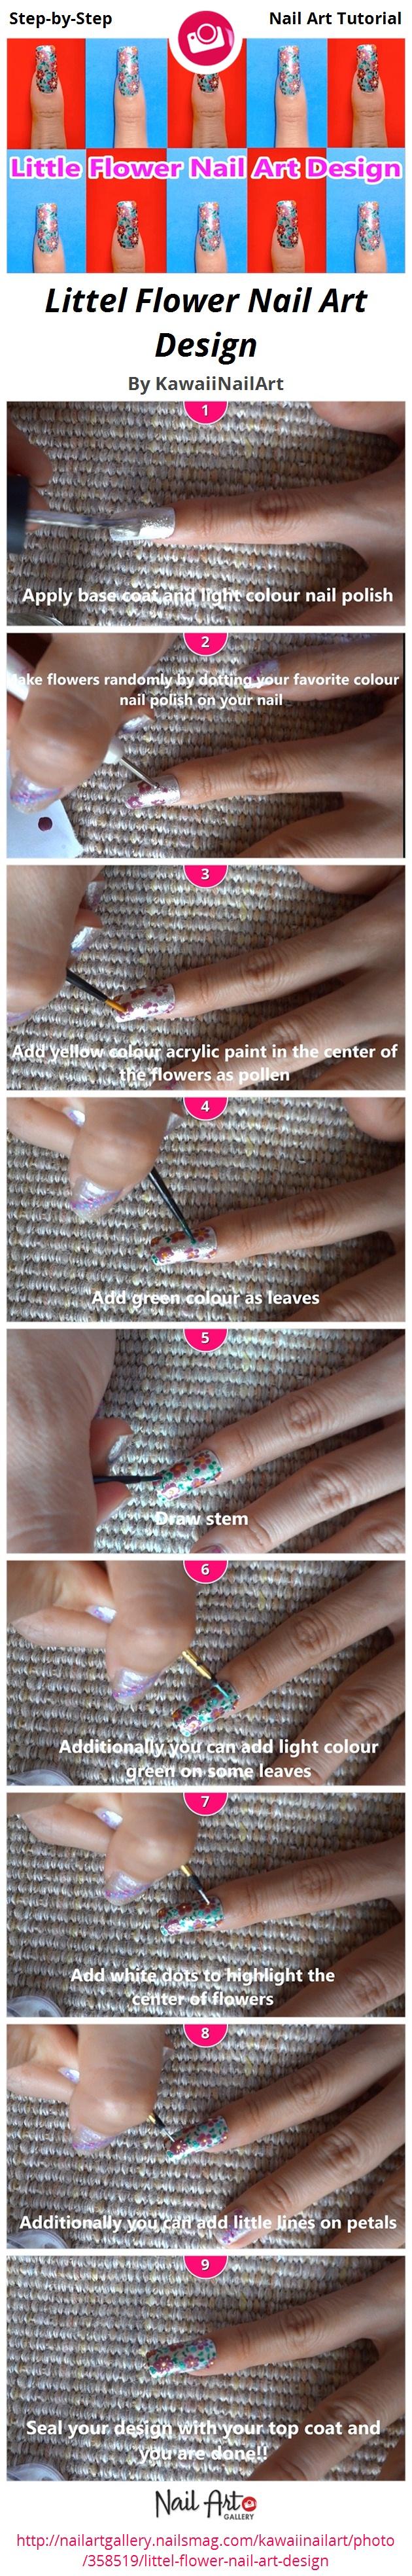 Littel Flower Nail Art Design - Nail Art Gallery